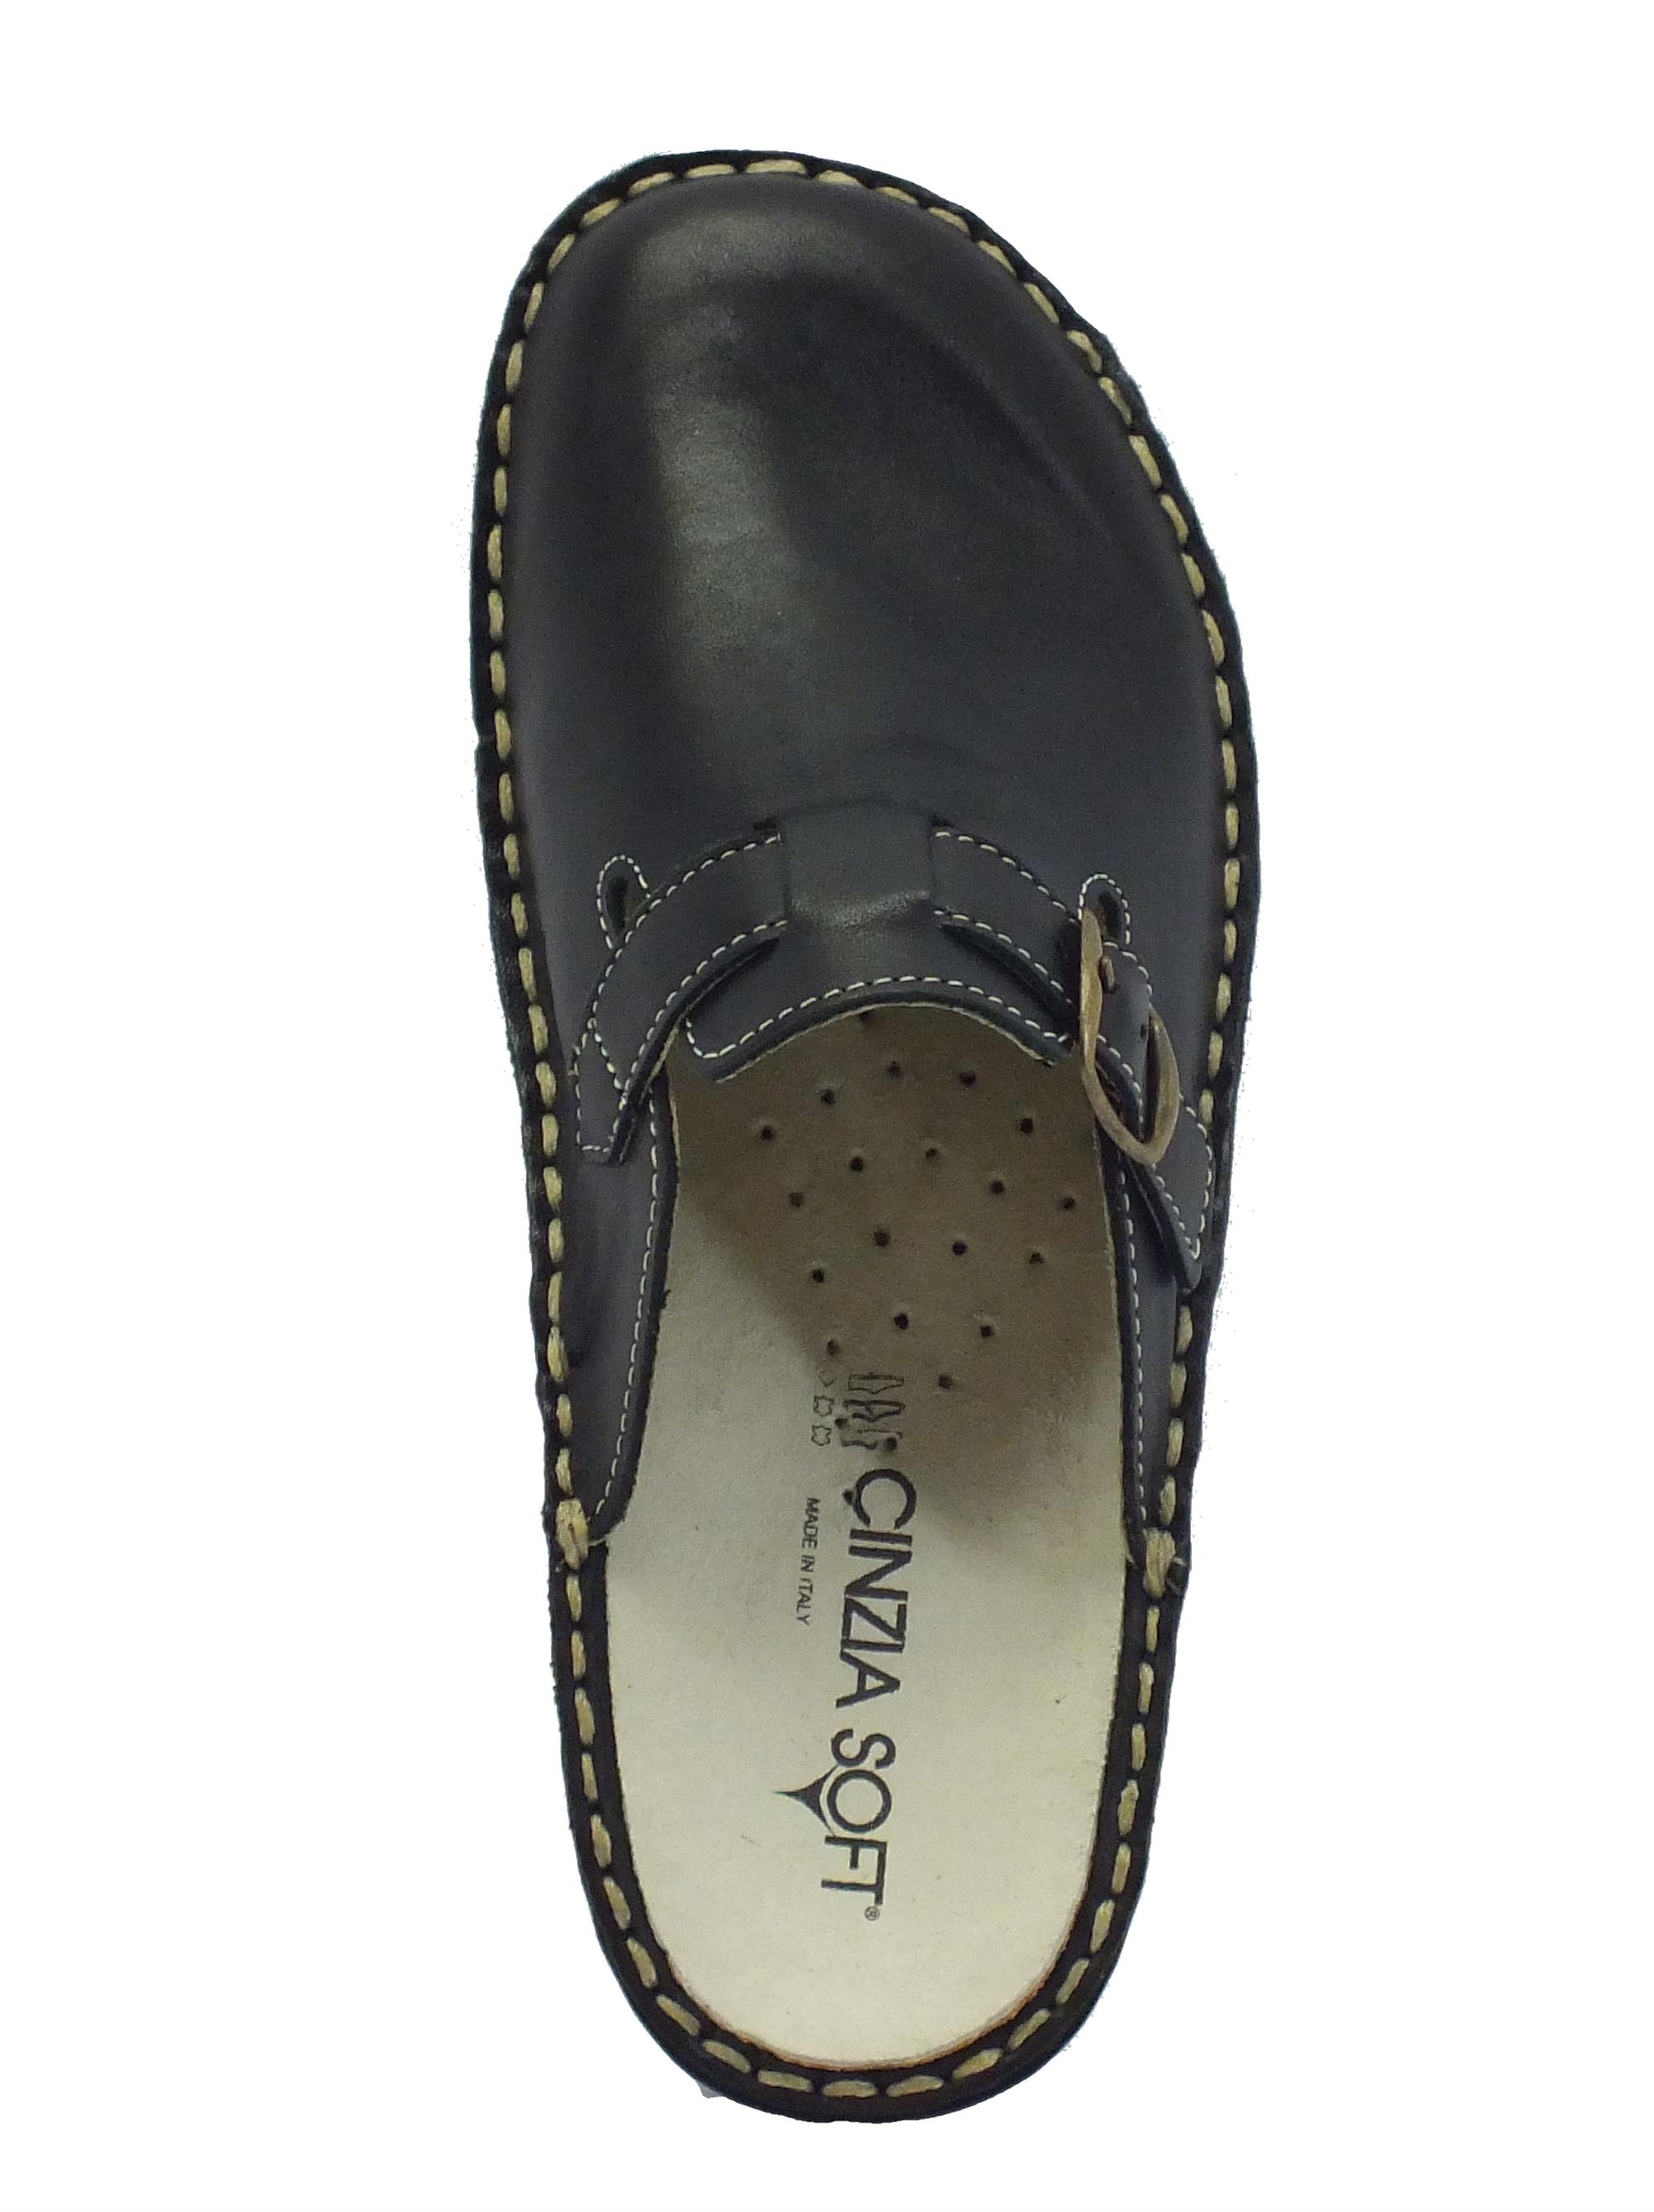 Pelle Donna Sottopiede Calzature Nera Soft Pantofole Cinzia Vitiello n8kNOP0wX